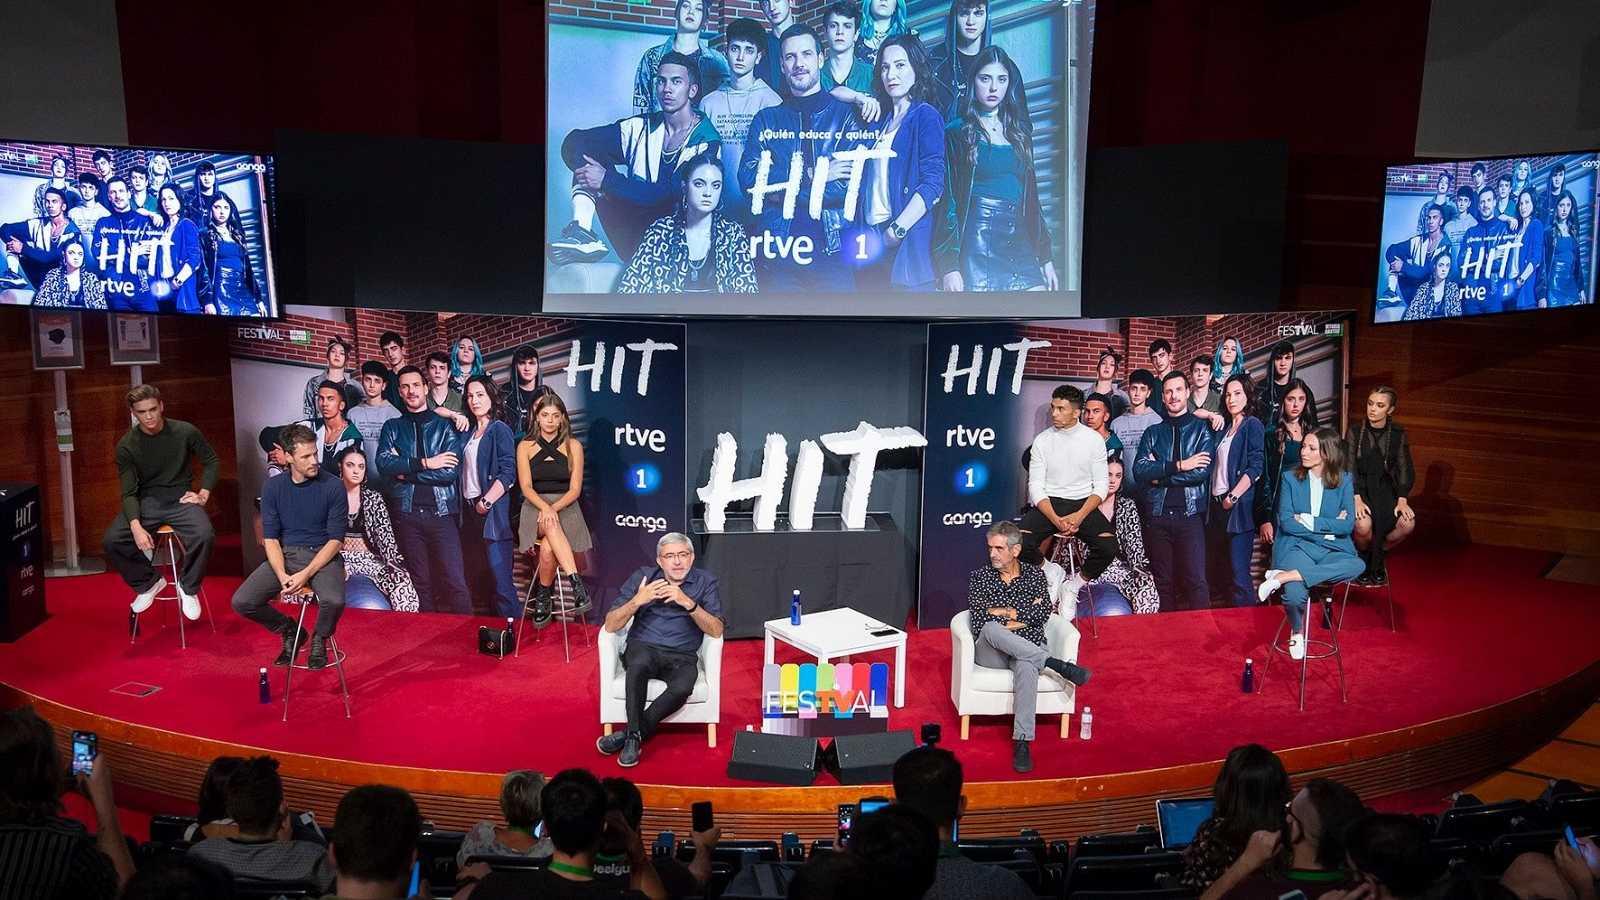 HIT - Rueda de prensa de 'HIT' en el FestVal de Vitoria